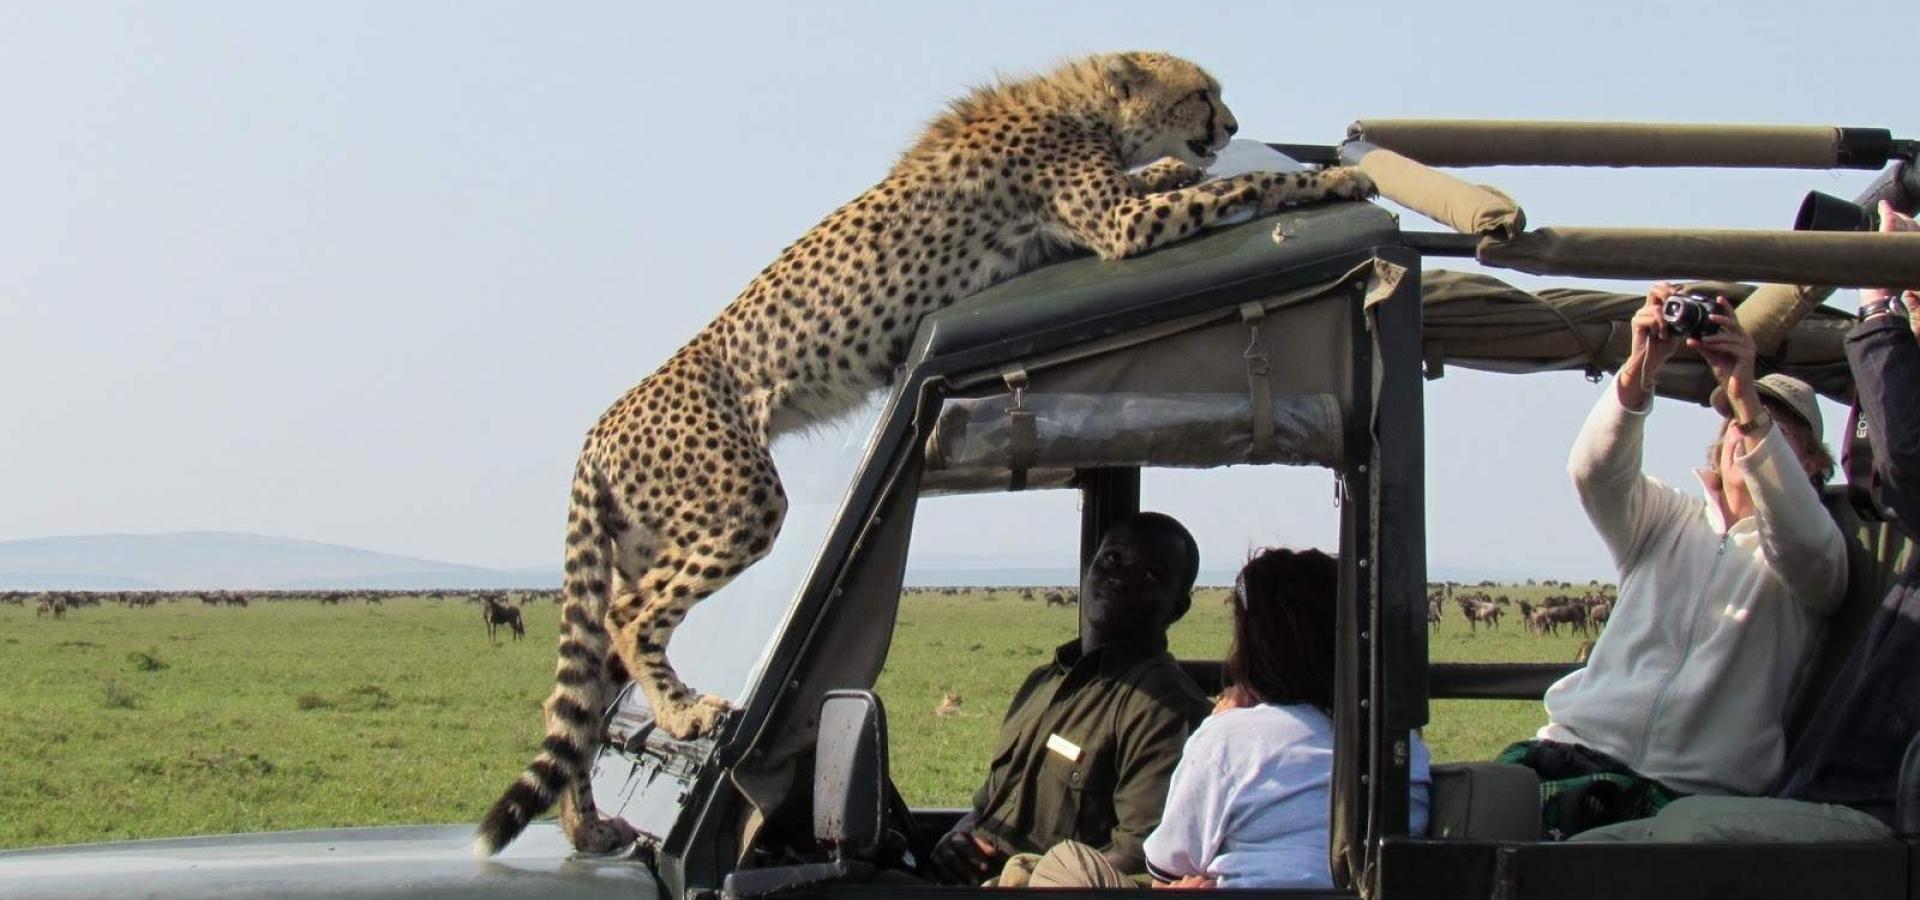 Tanzania - Safari Fauna Salvaje La Magia de Africa